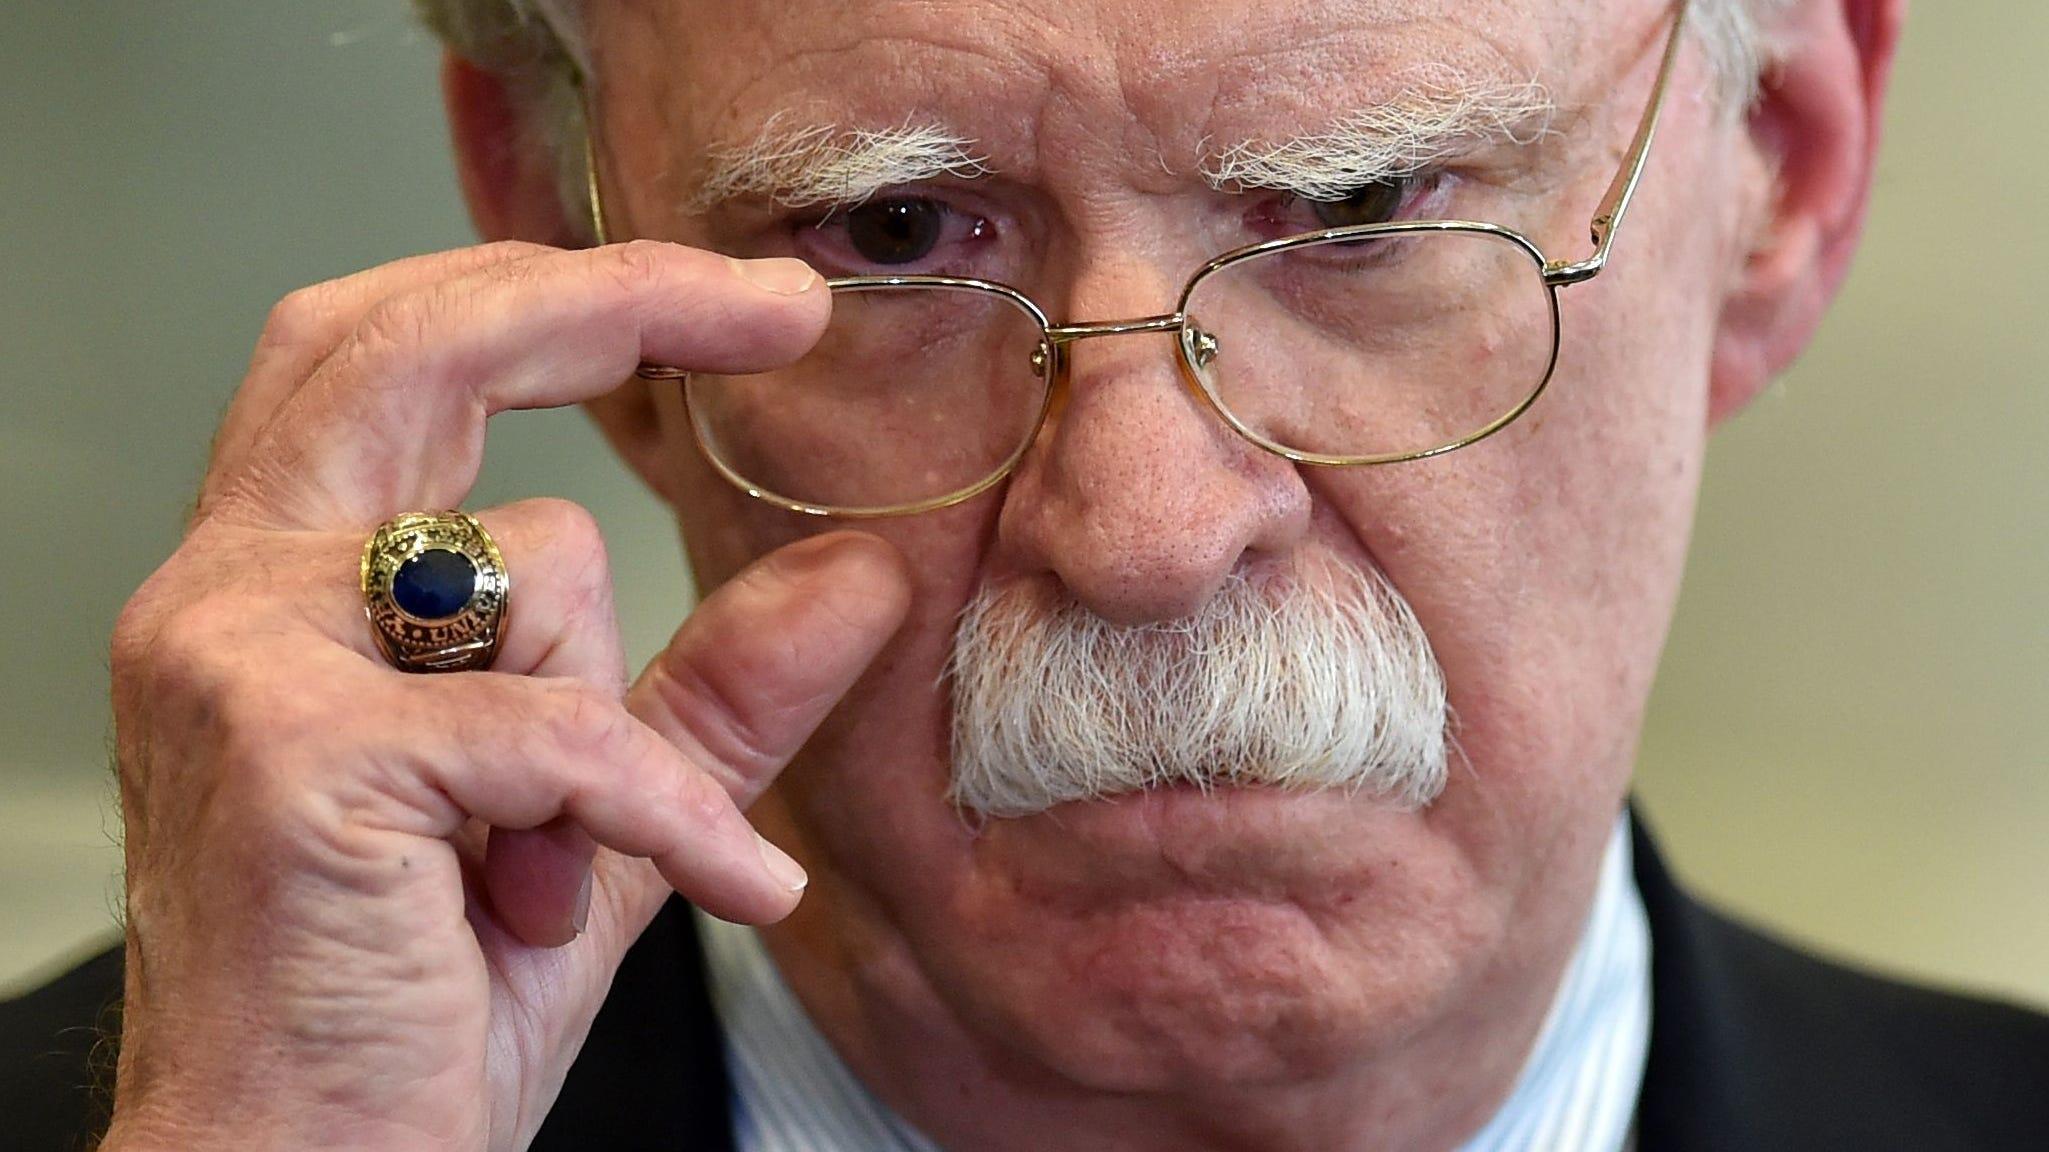 John Bolton decried Giuliani effort to pressure Ukraine as 'drug deal,' ex-aide Fiona Hill testifies, reports say